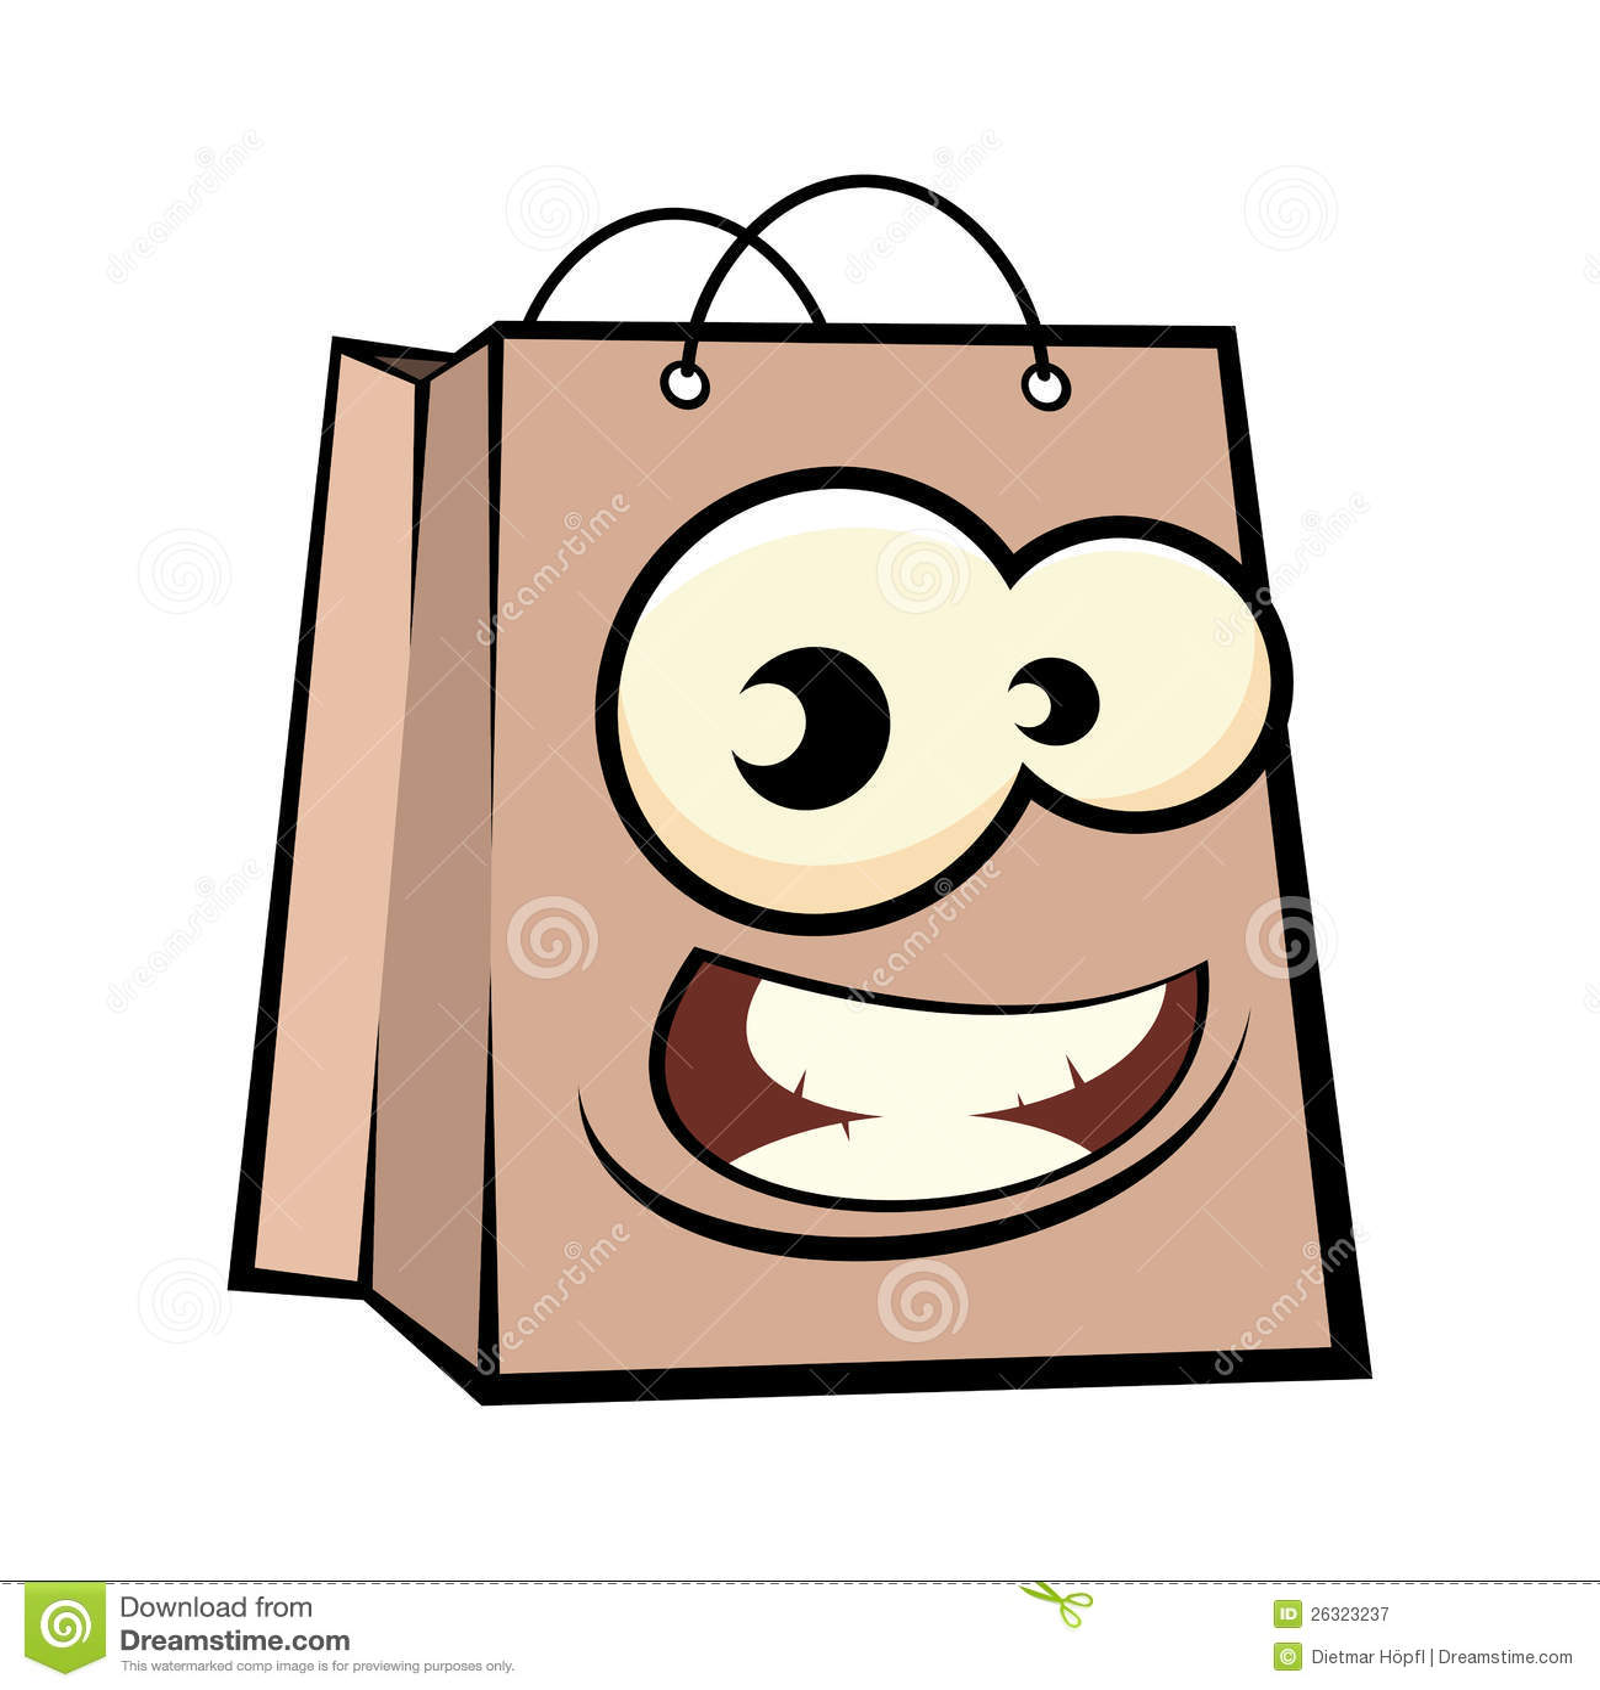 Cartoon Face On Shopping Bag Royalty Free Stock Photography - Image ...